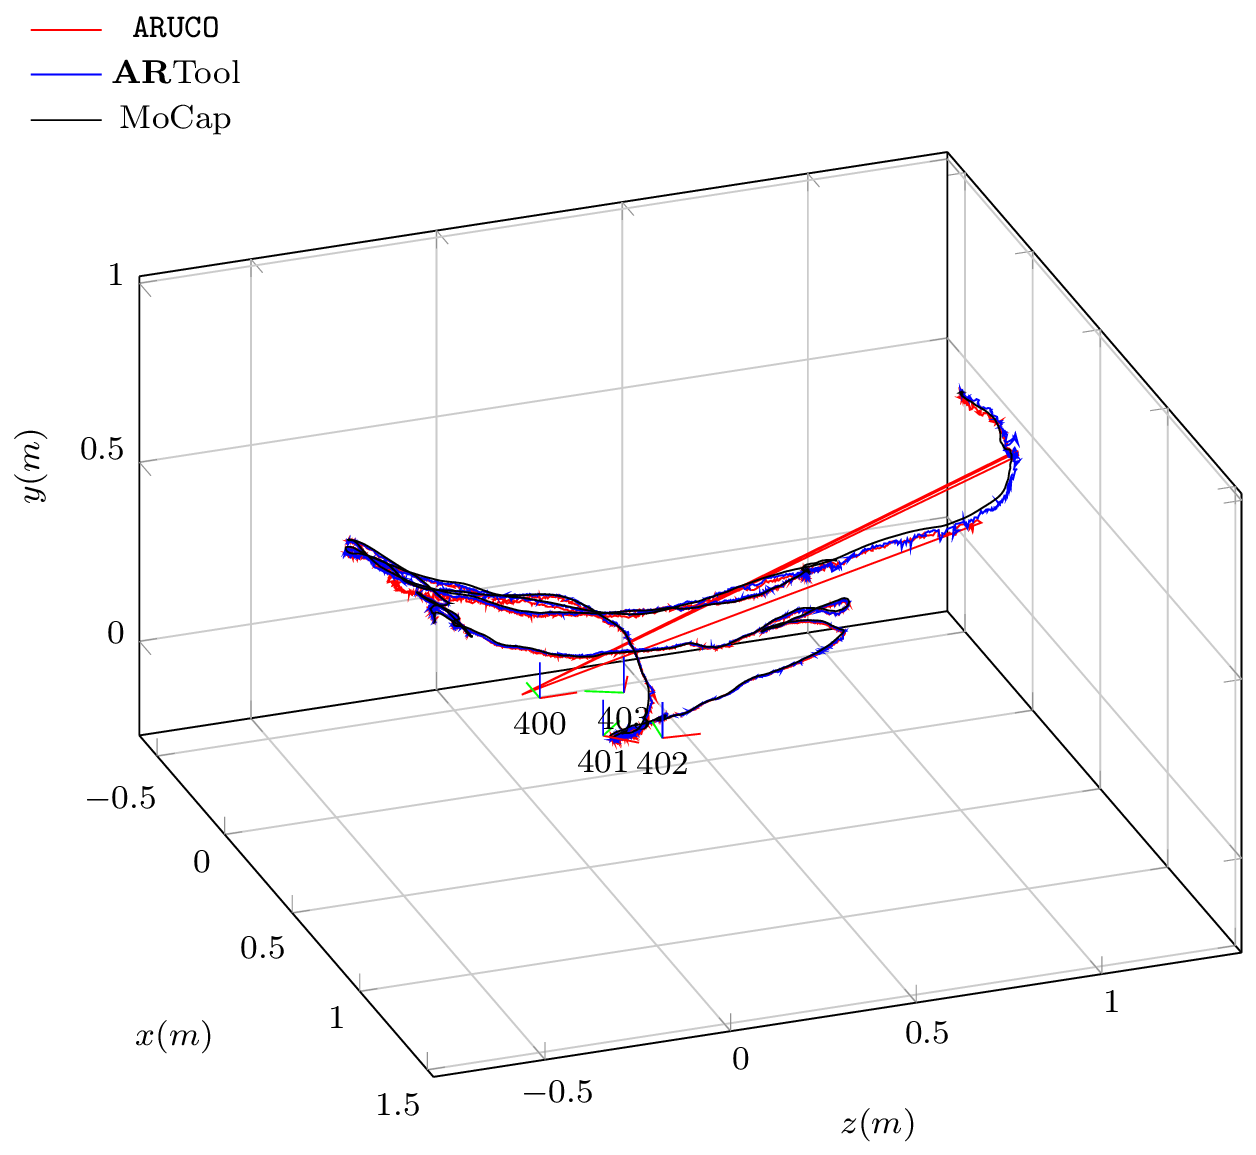 ARTool - Augmented Reality Platform for Machining Setup and